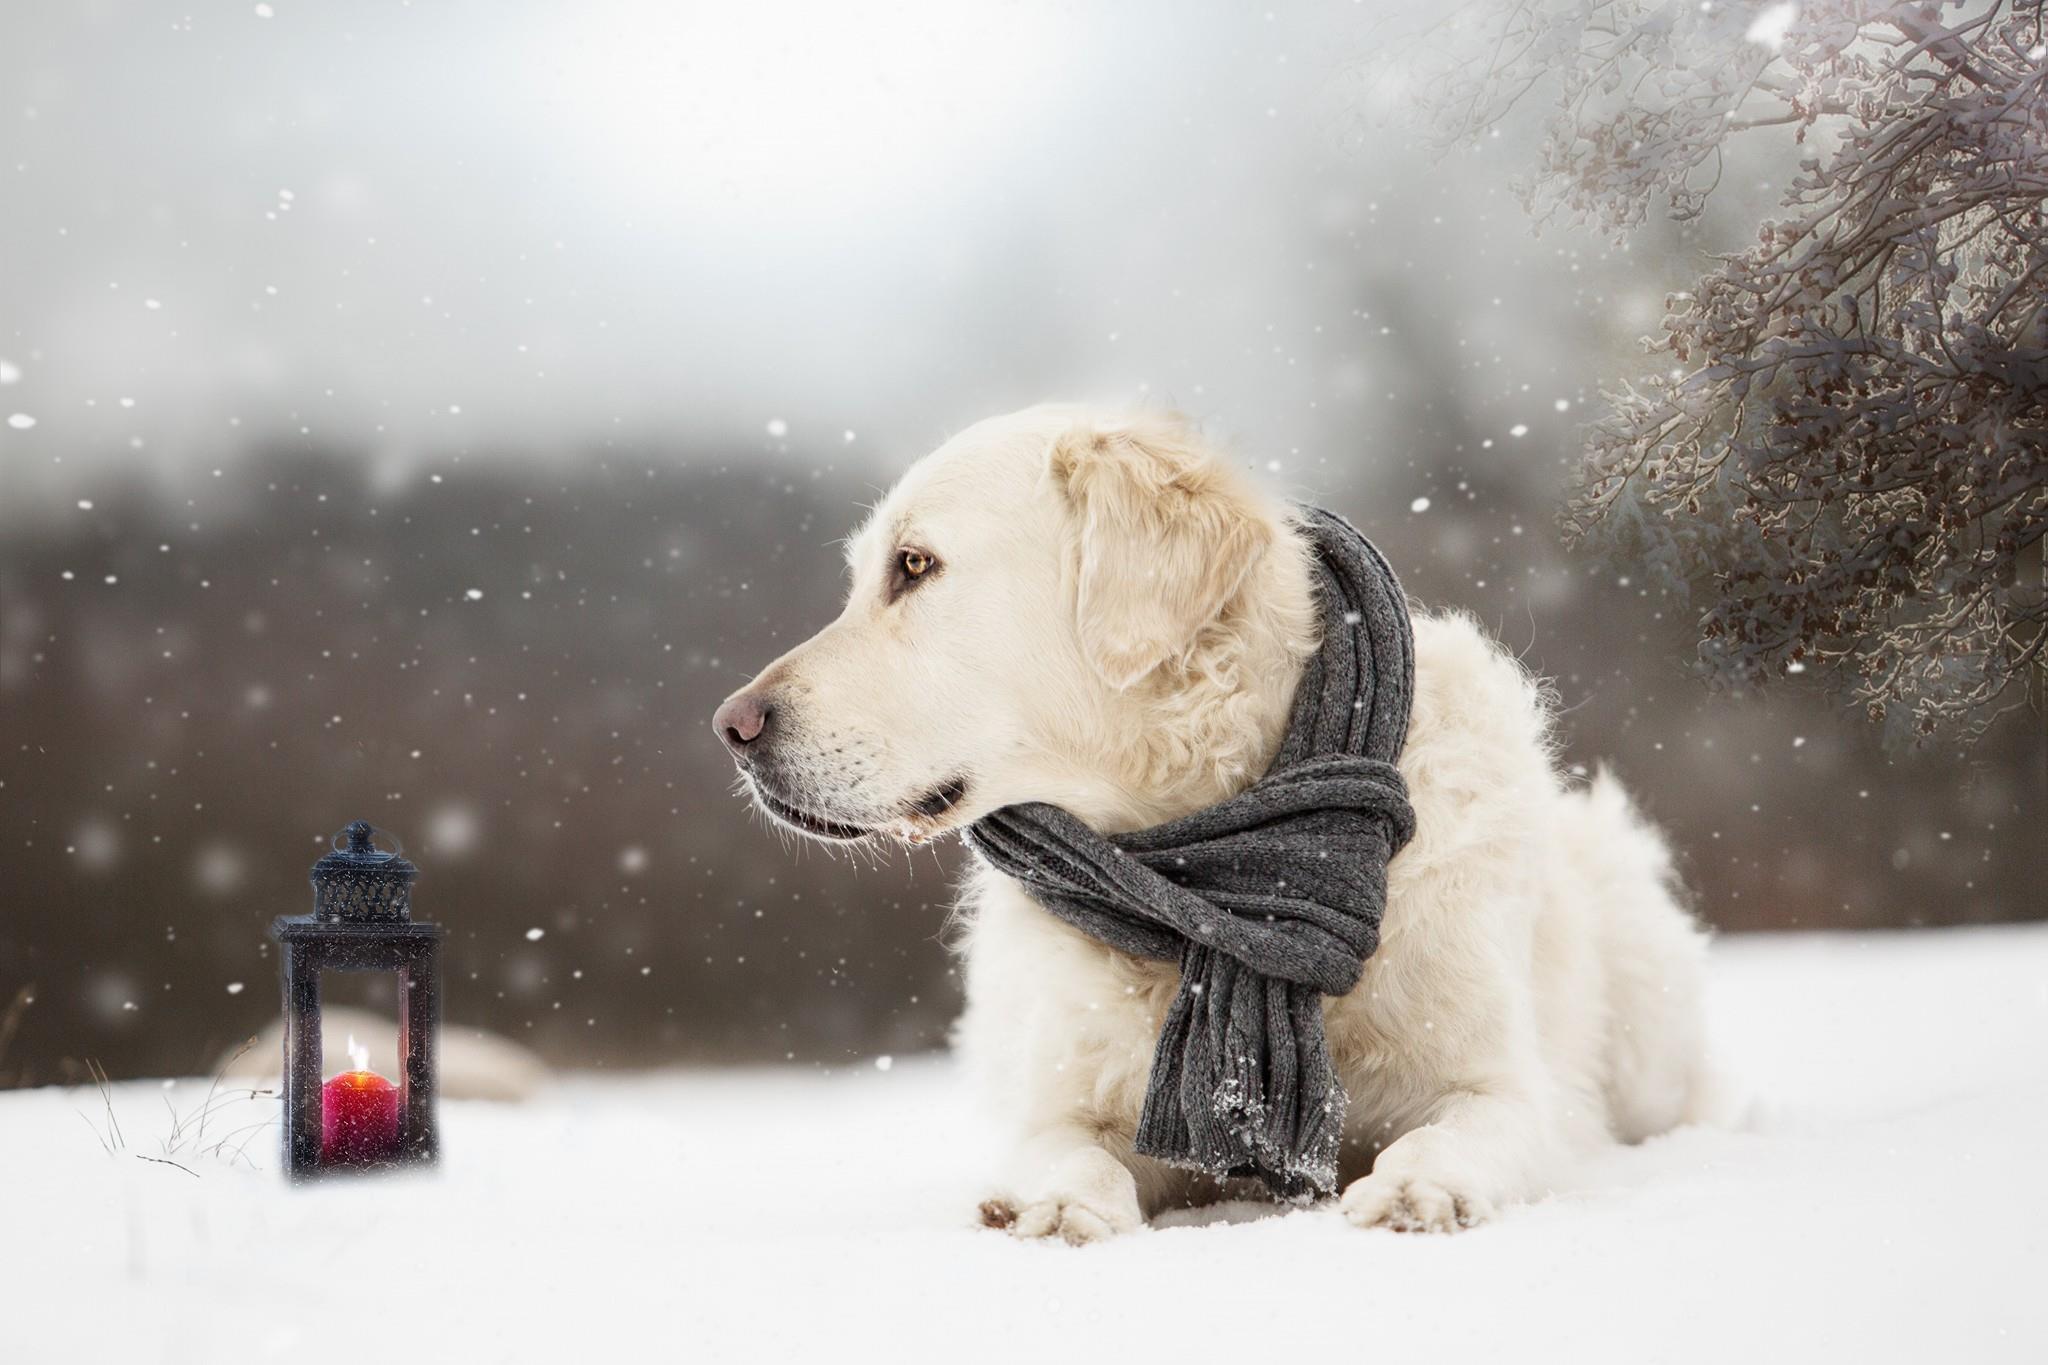 Dog Pet Snowfall Scarf Depth Of Field Winter Snow Lantern 2048x1365